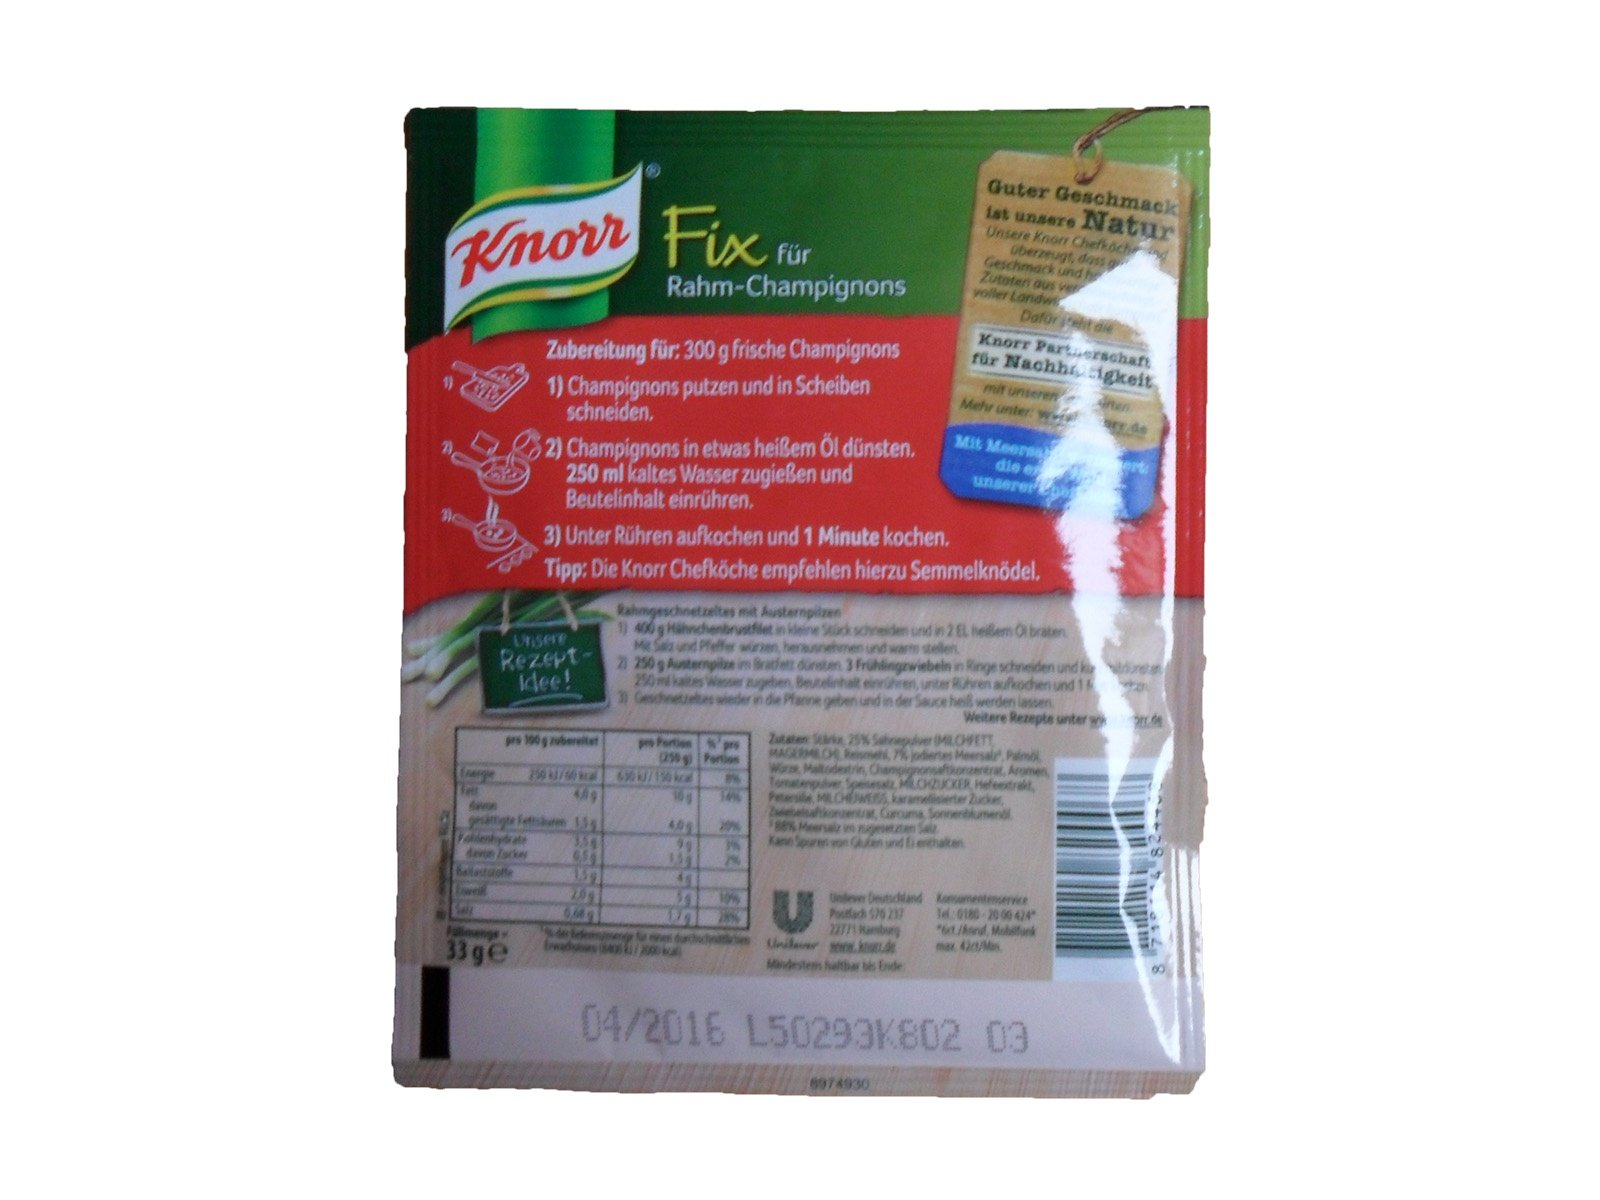 Knorr Fix für Rahm Champignons